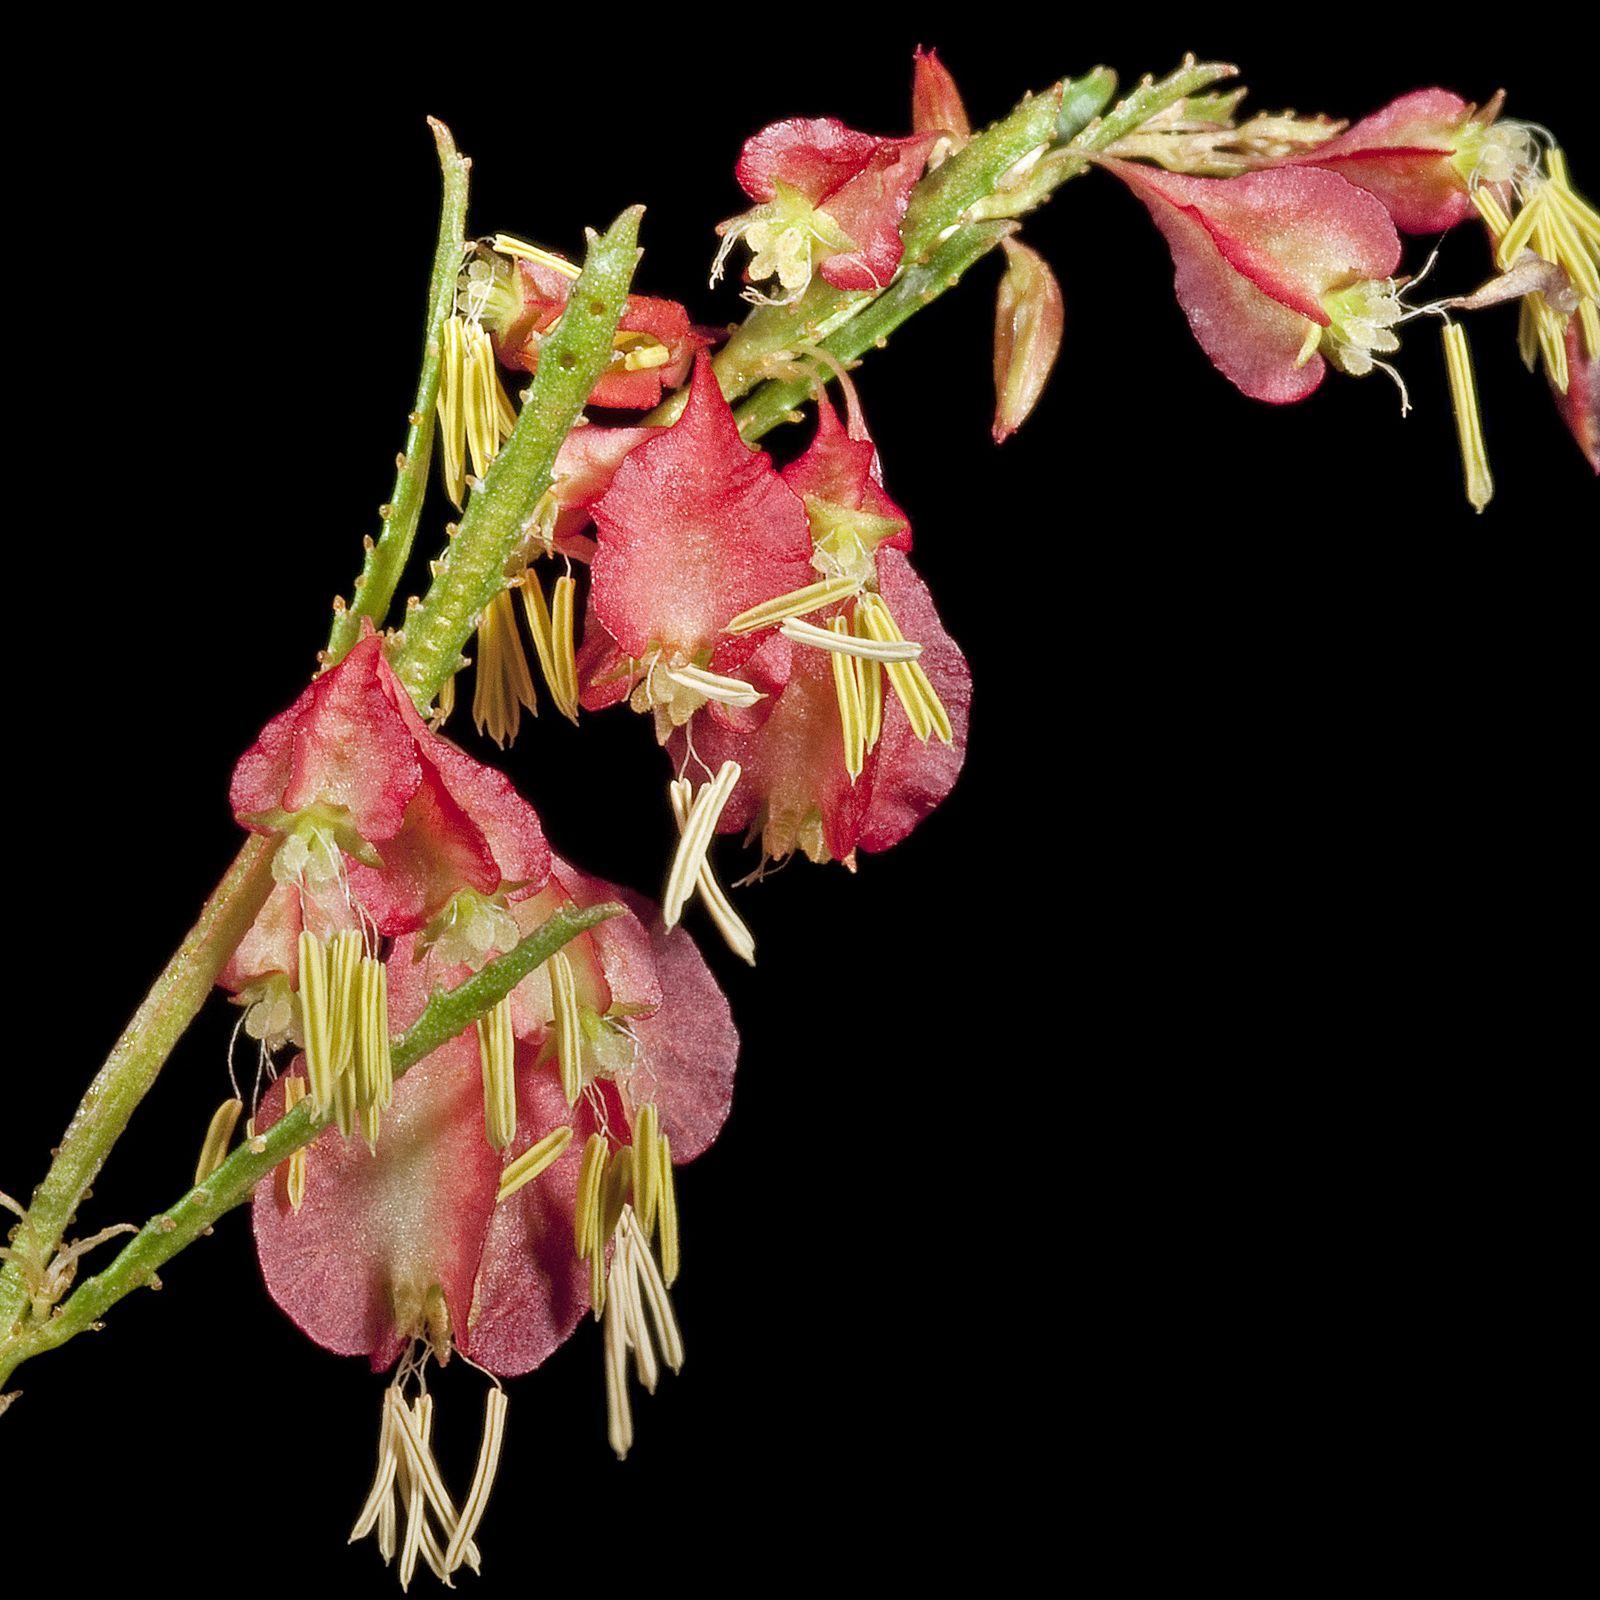 HALORAGODENDRON glandulosum Herb seeds, Flowers, Plants